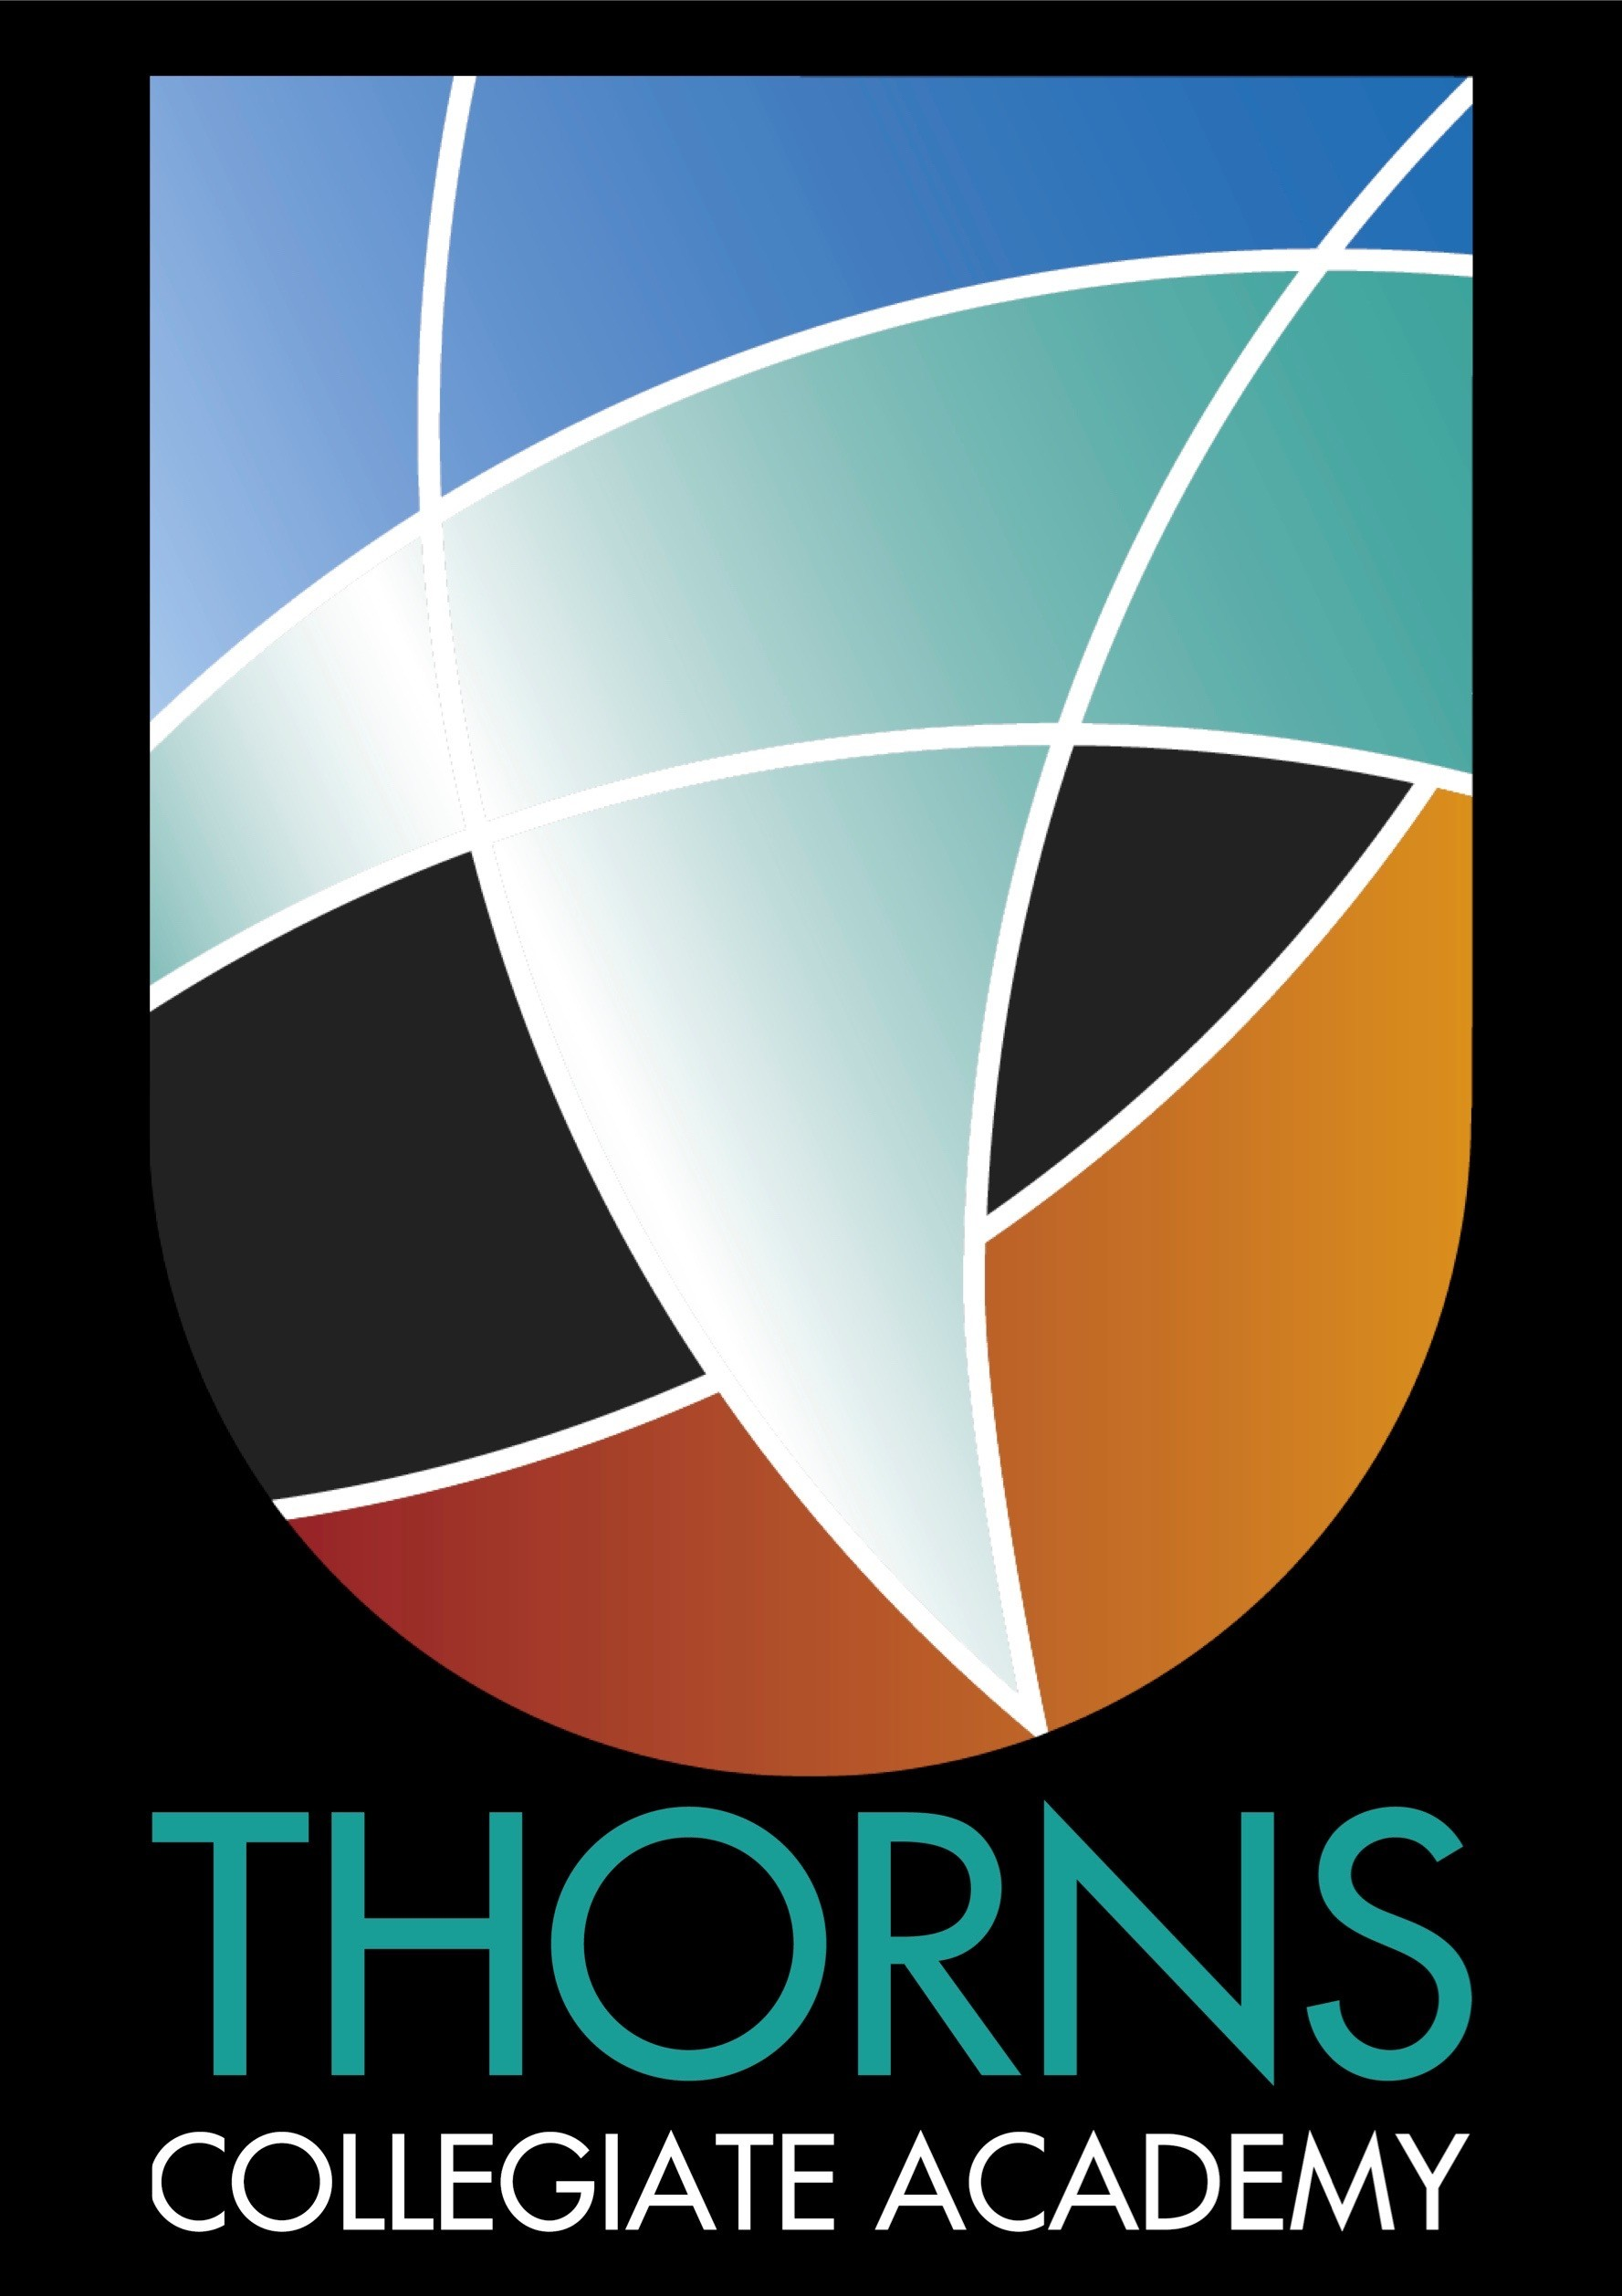 Thorns collegiate academy